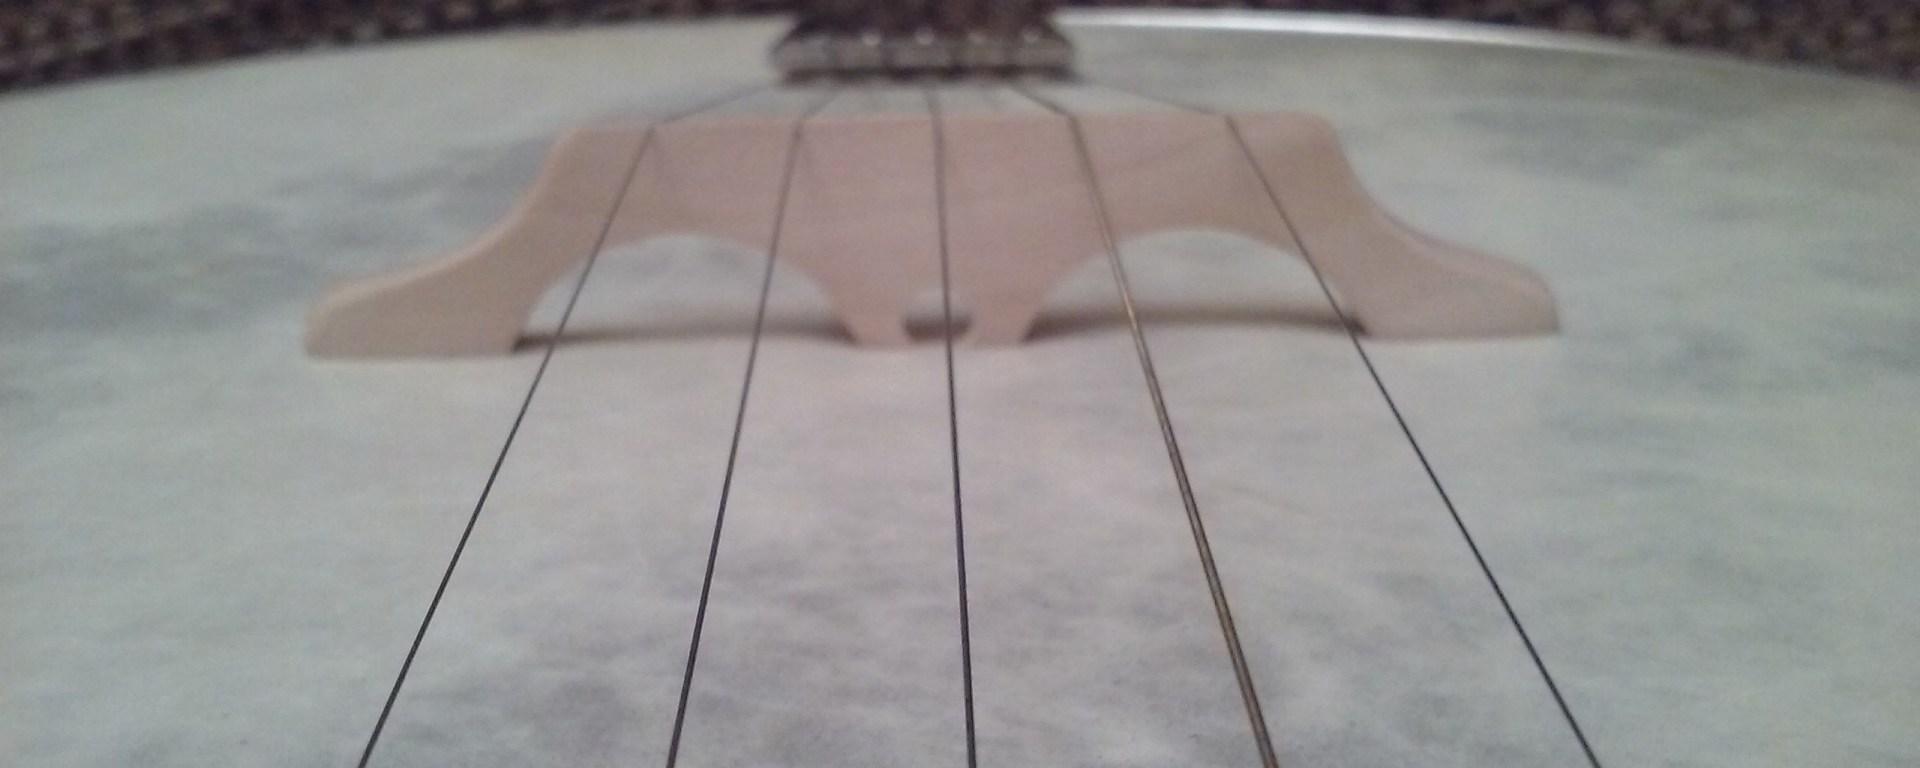 Custom banjo bridge by Mac Traynham